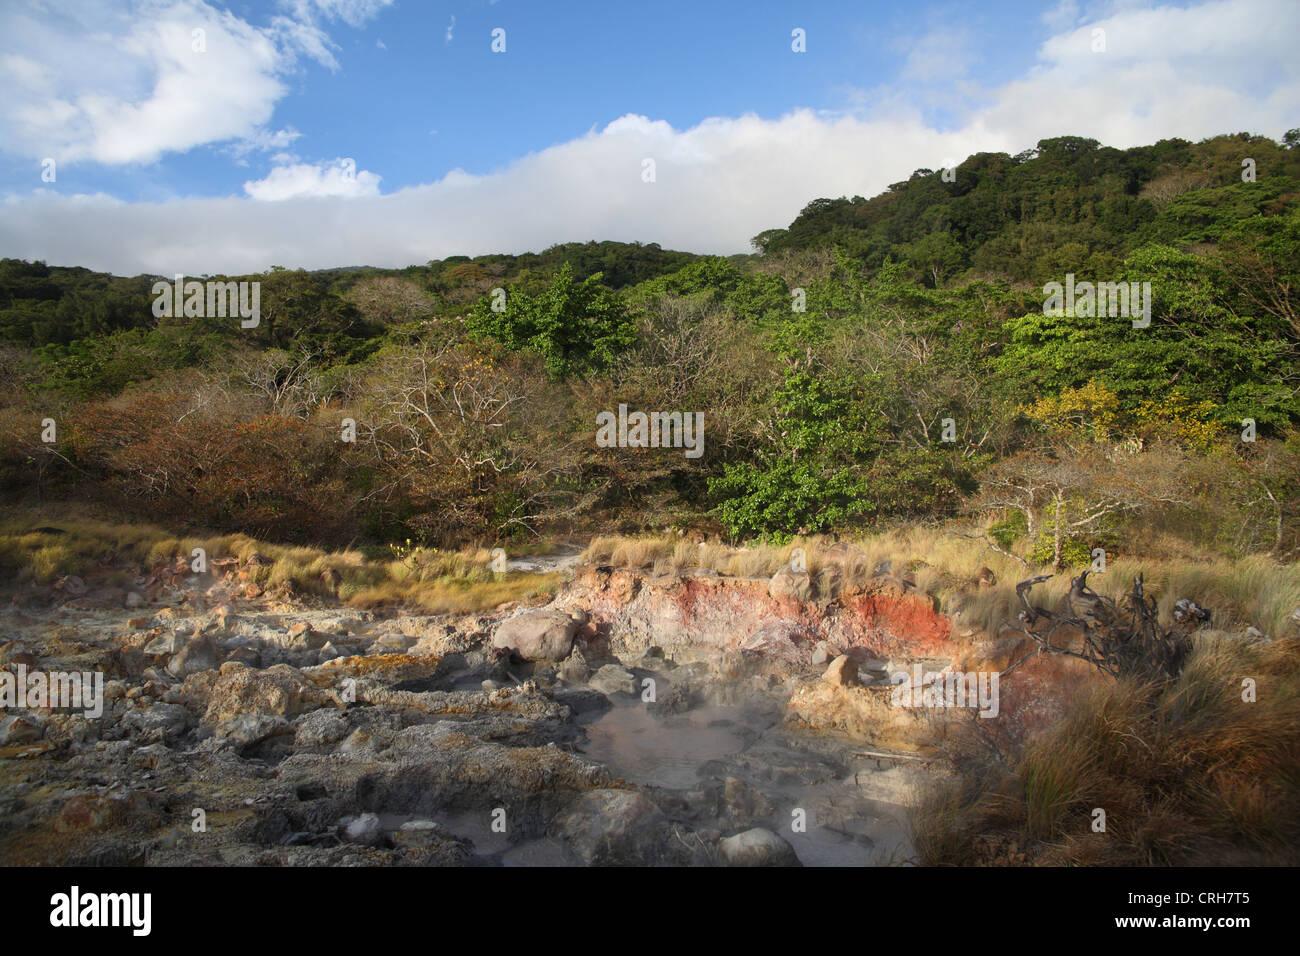 Volcanic fumaroles. Las Pailas trail, Rincon de la Vieja National Park, Guanacaste, Costa Rica. February 2012. - Stock Image